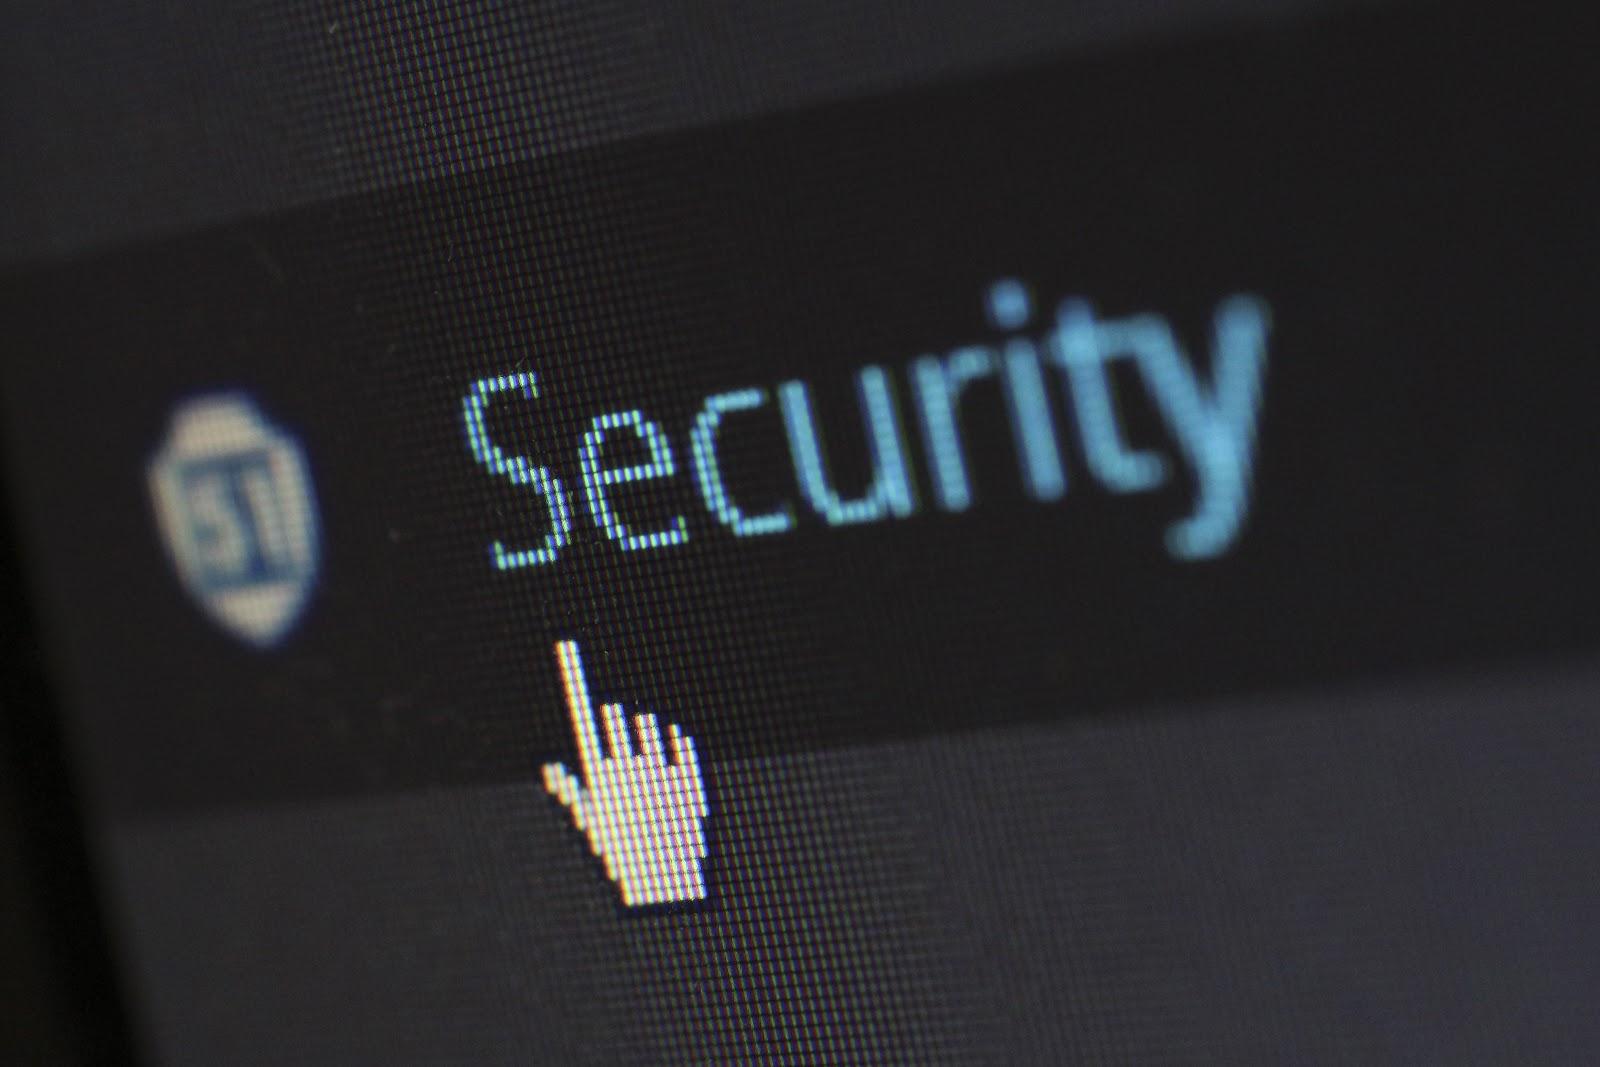 Digital modernization security notifications